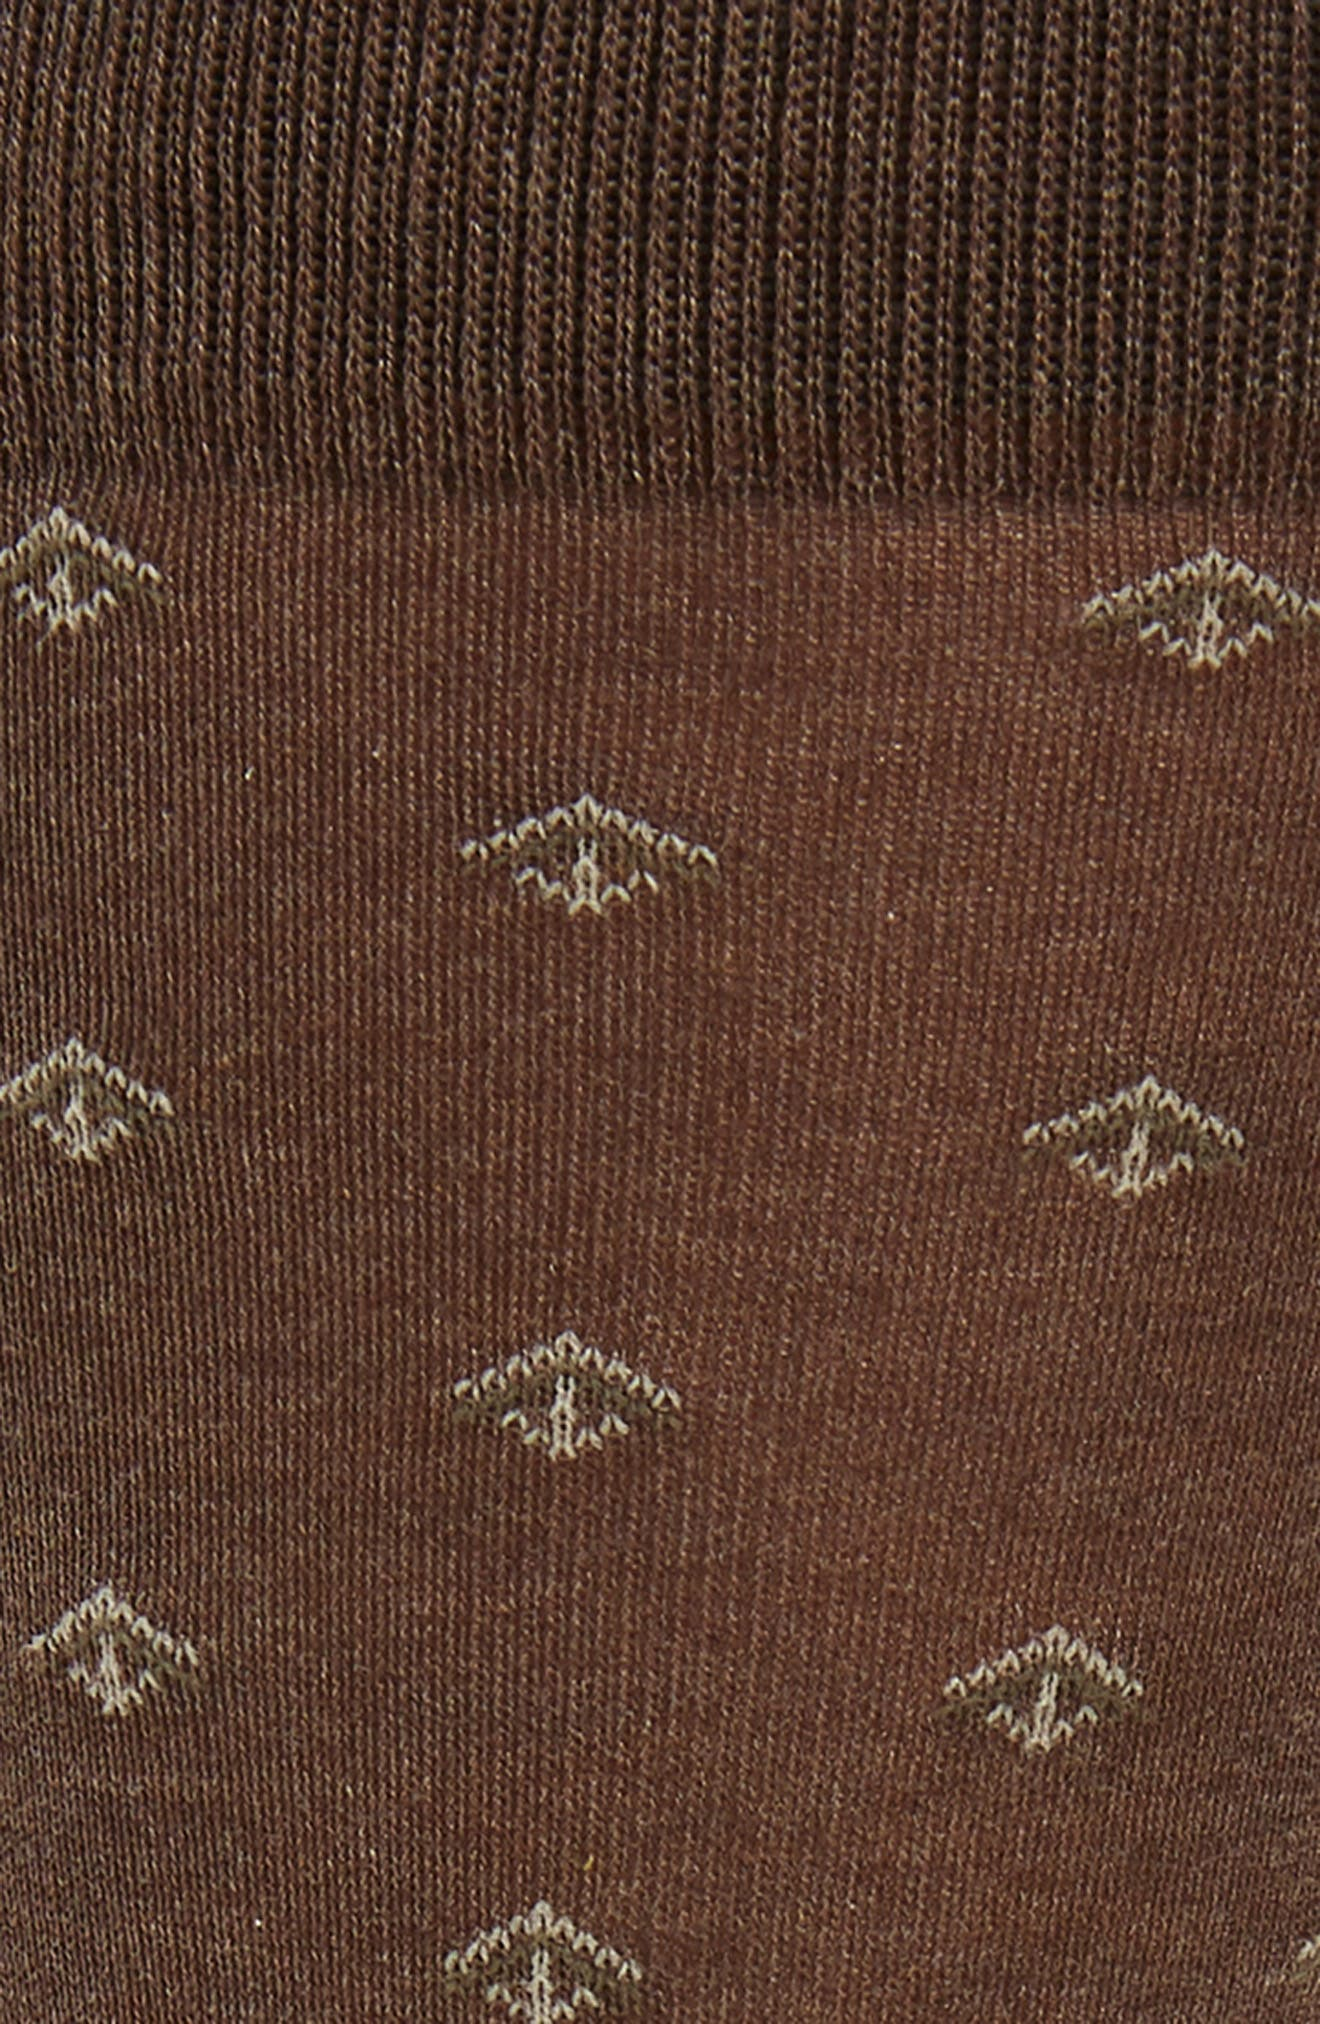 Cascading Arrows Socks,                             Alternate thumbnail 2, color,                             Brown Heather